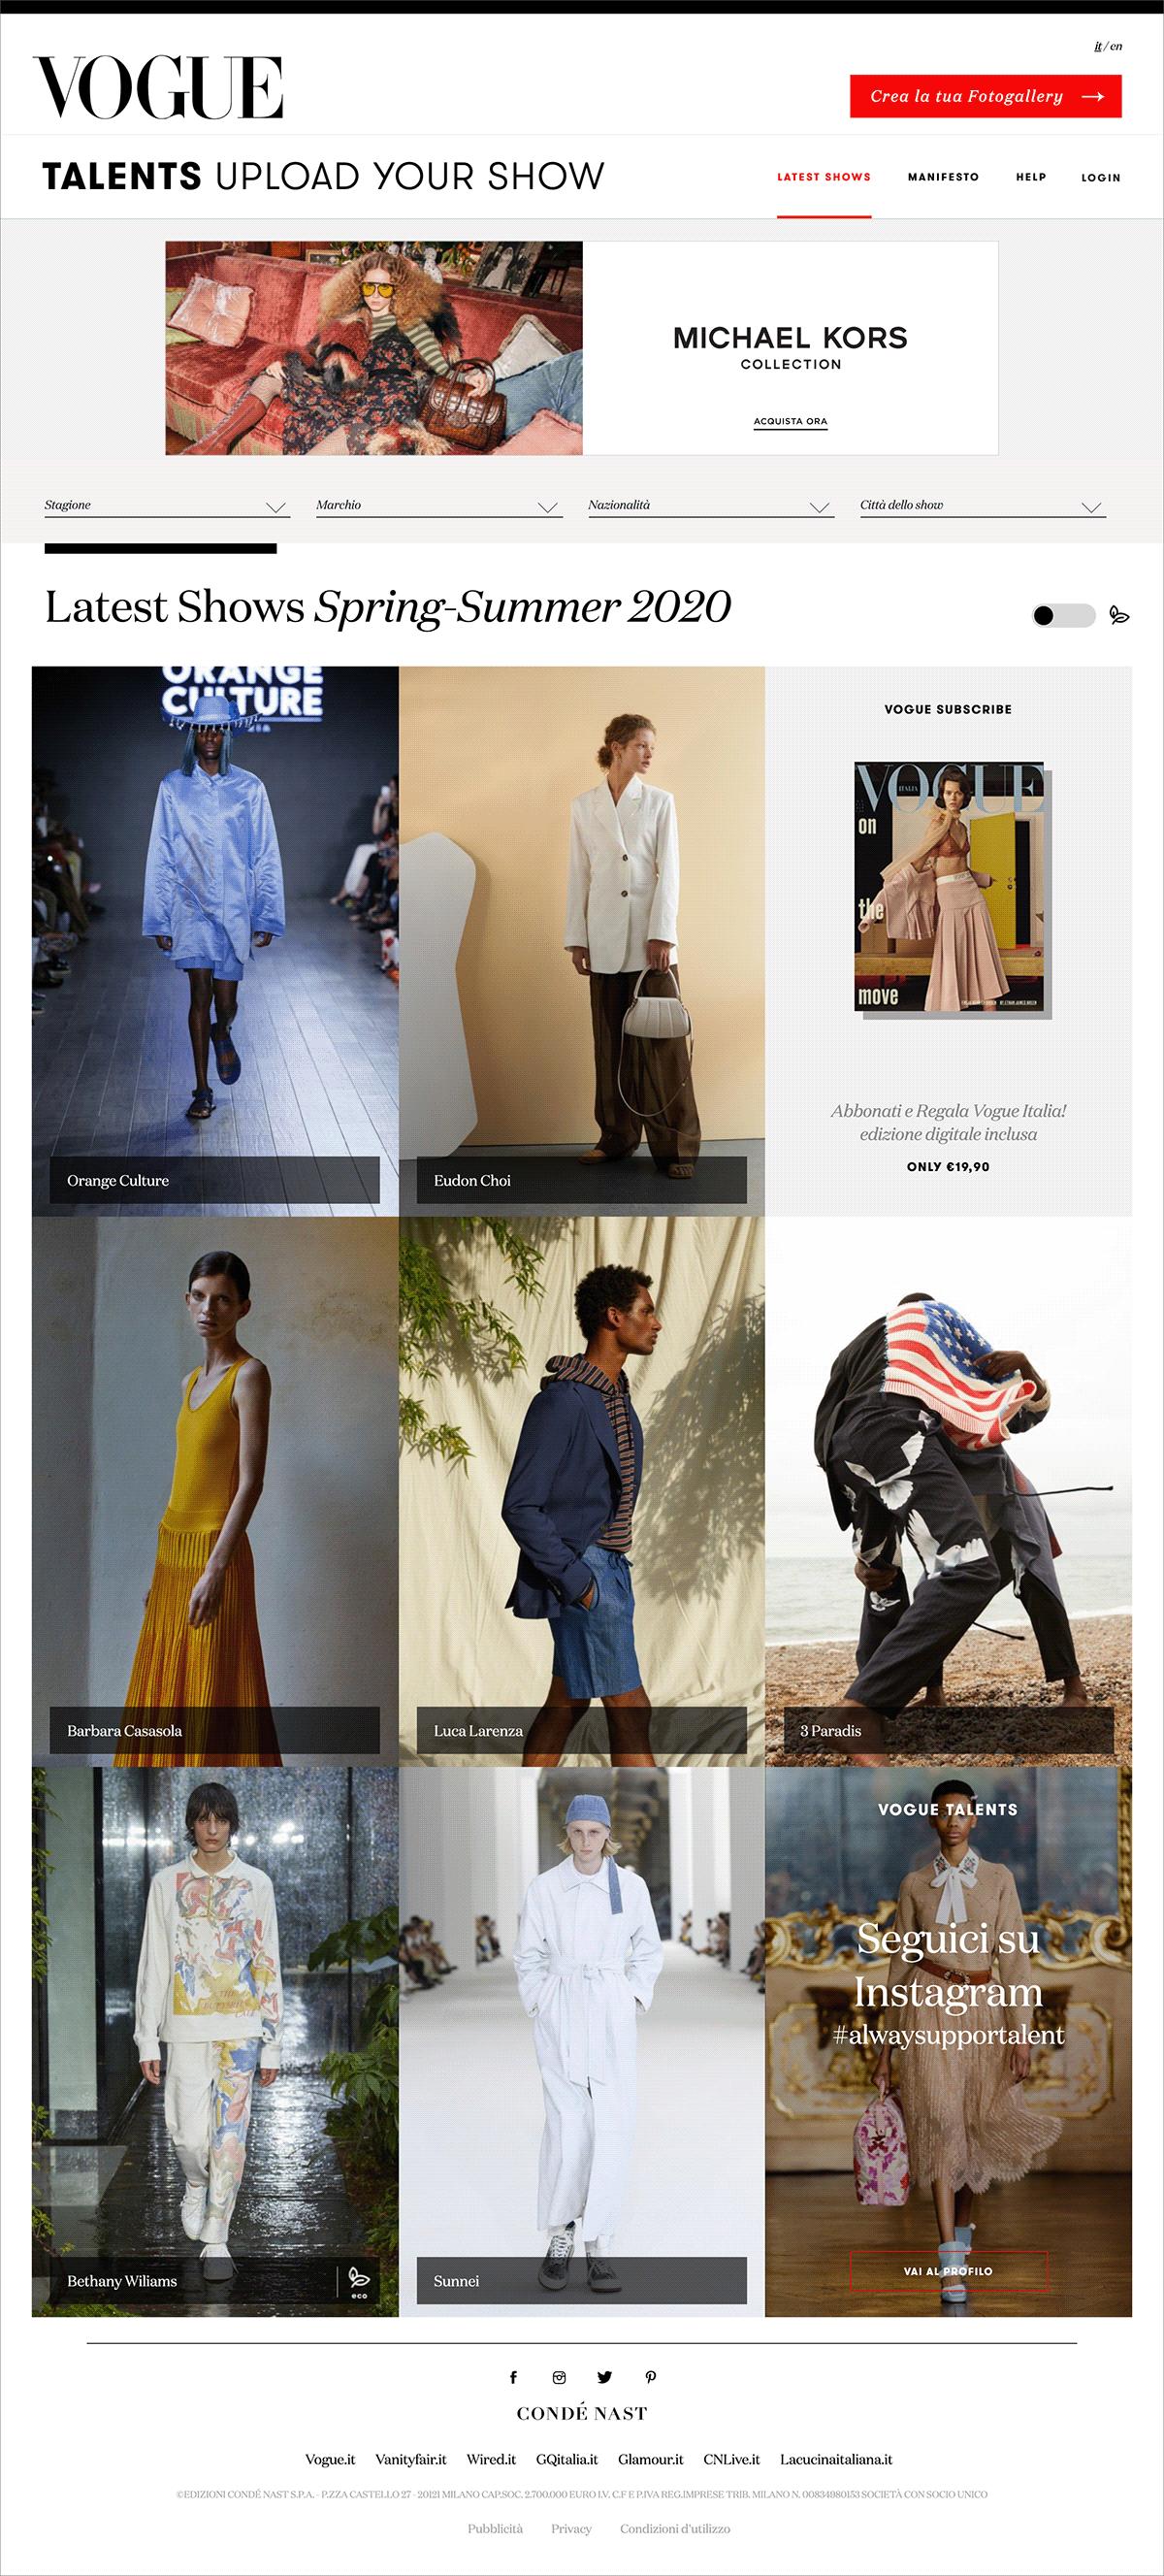 runway talents vogue UGC fashion show